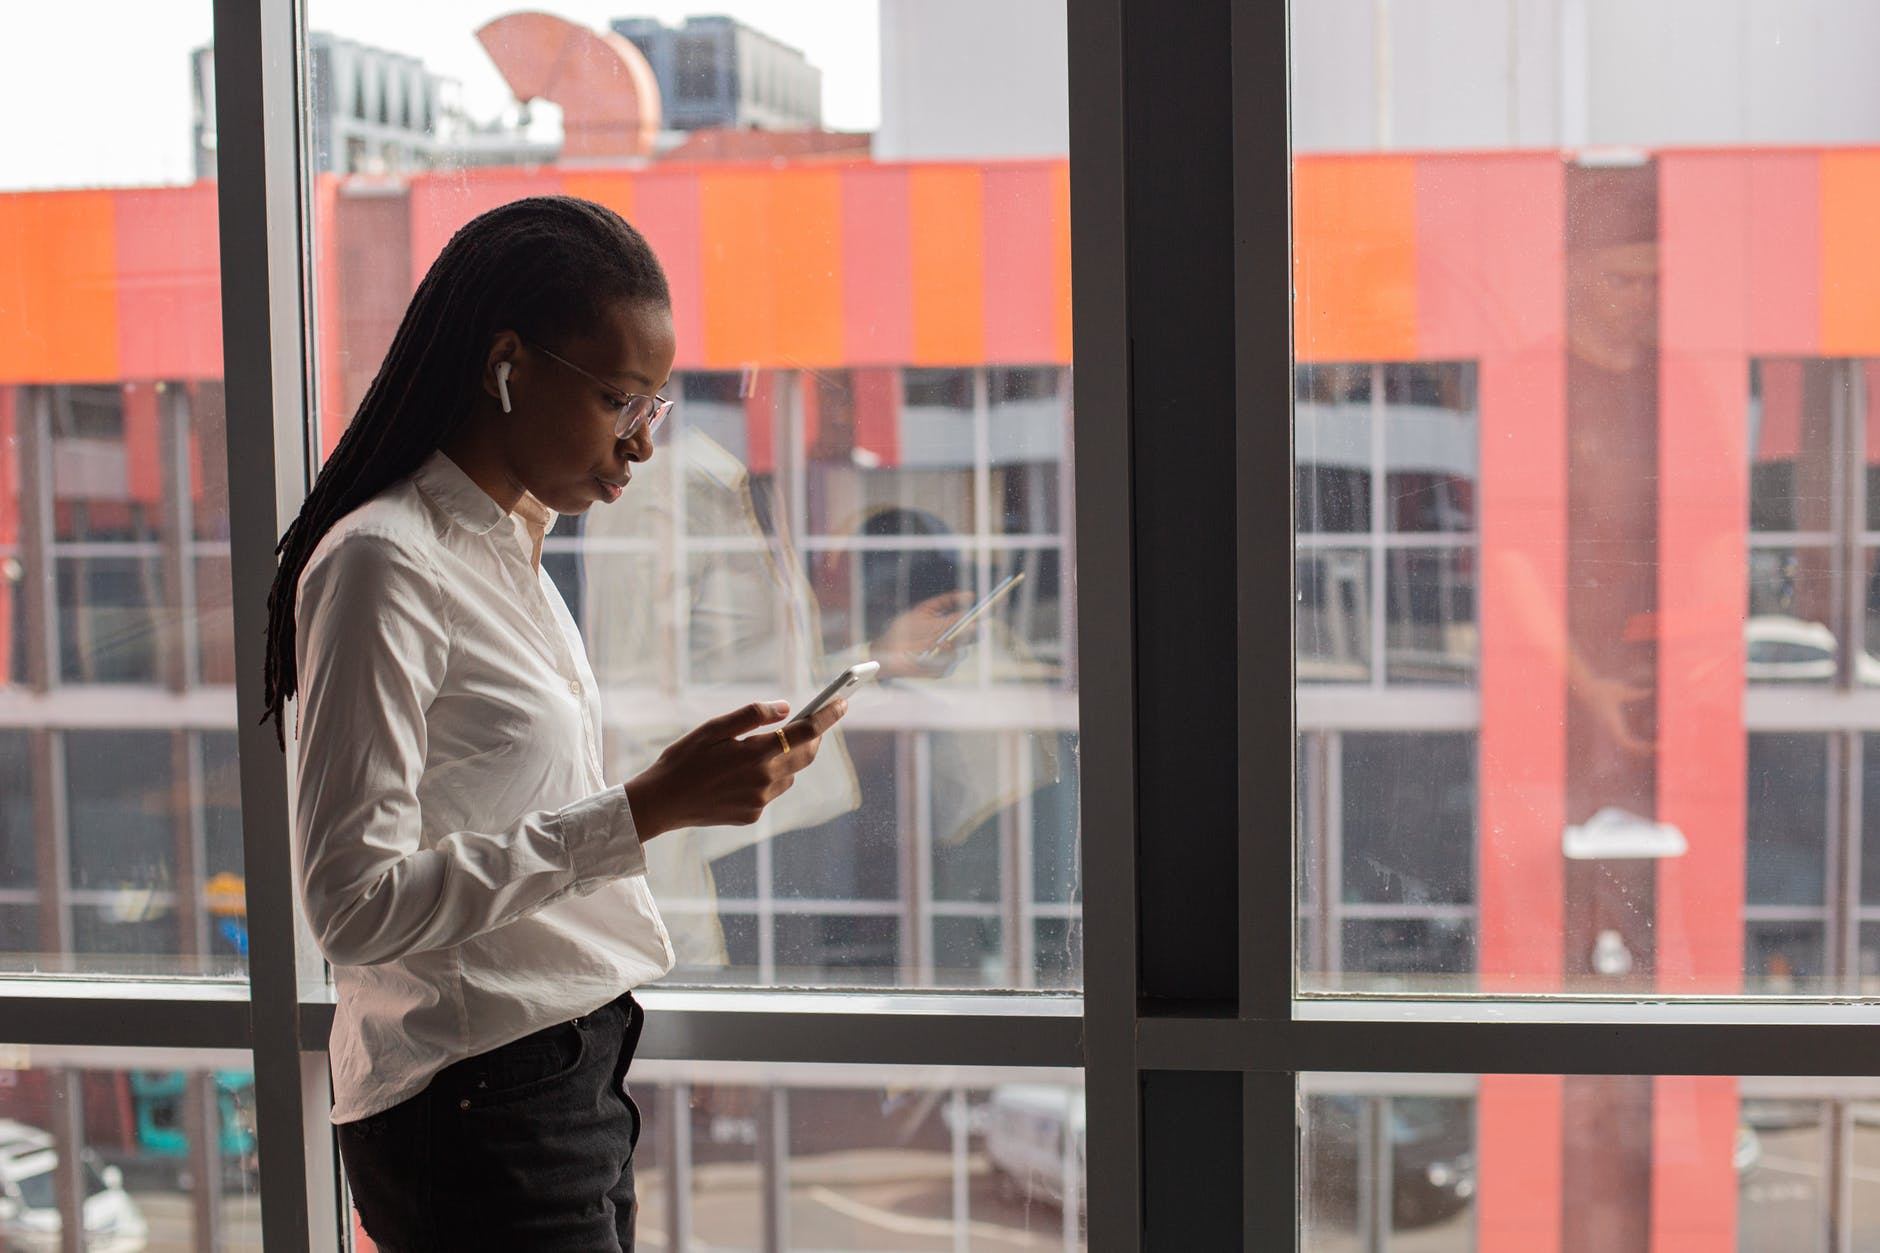 a lady reading thru her phone